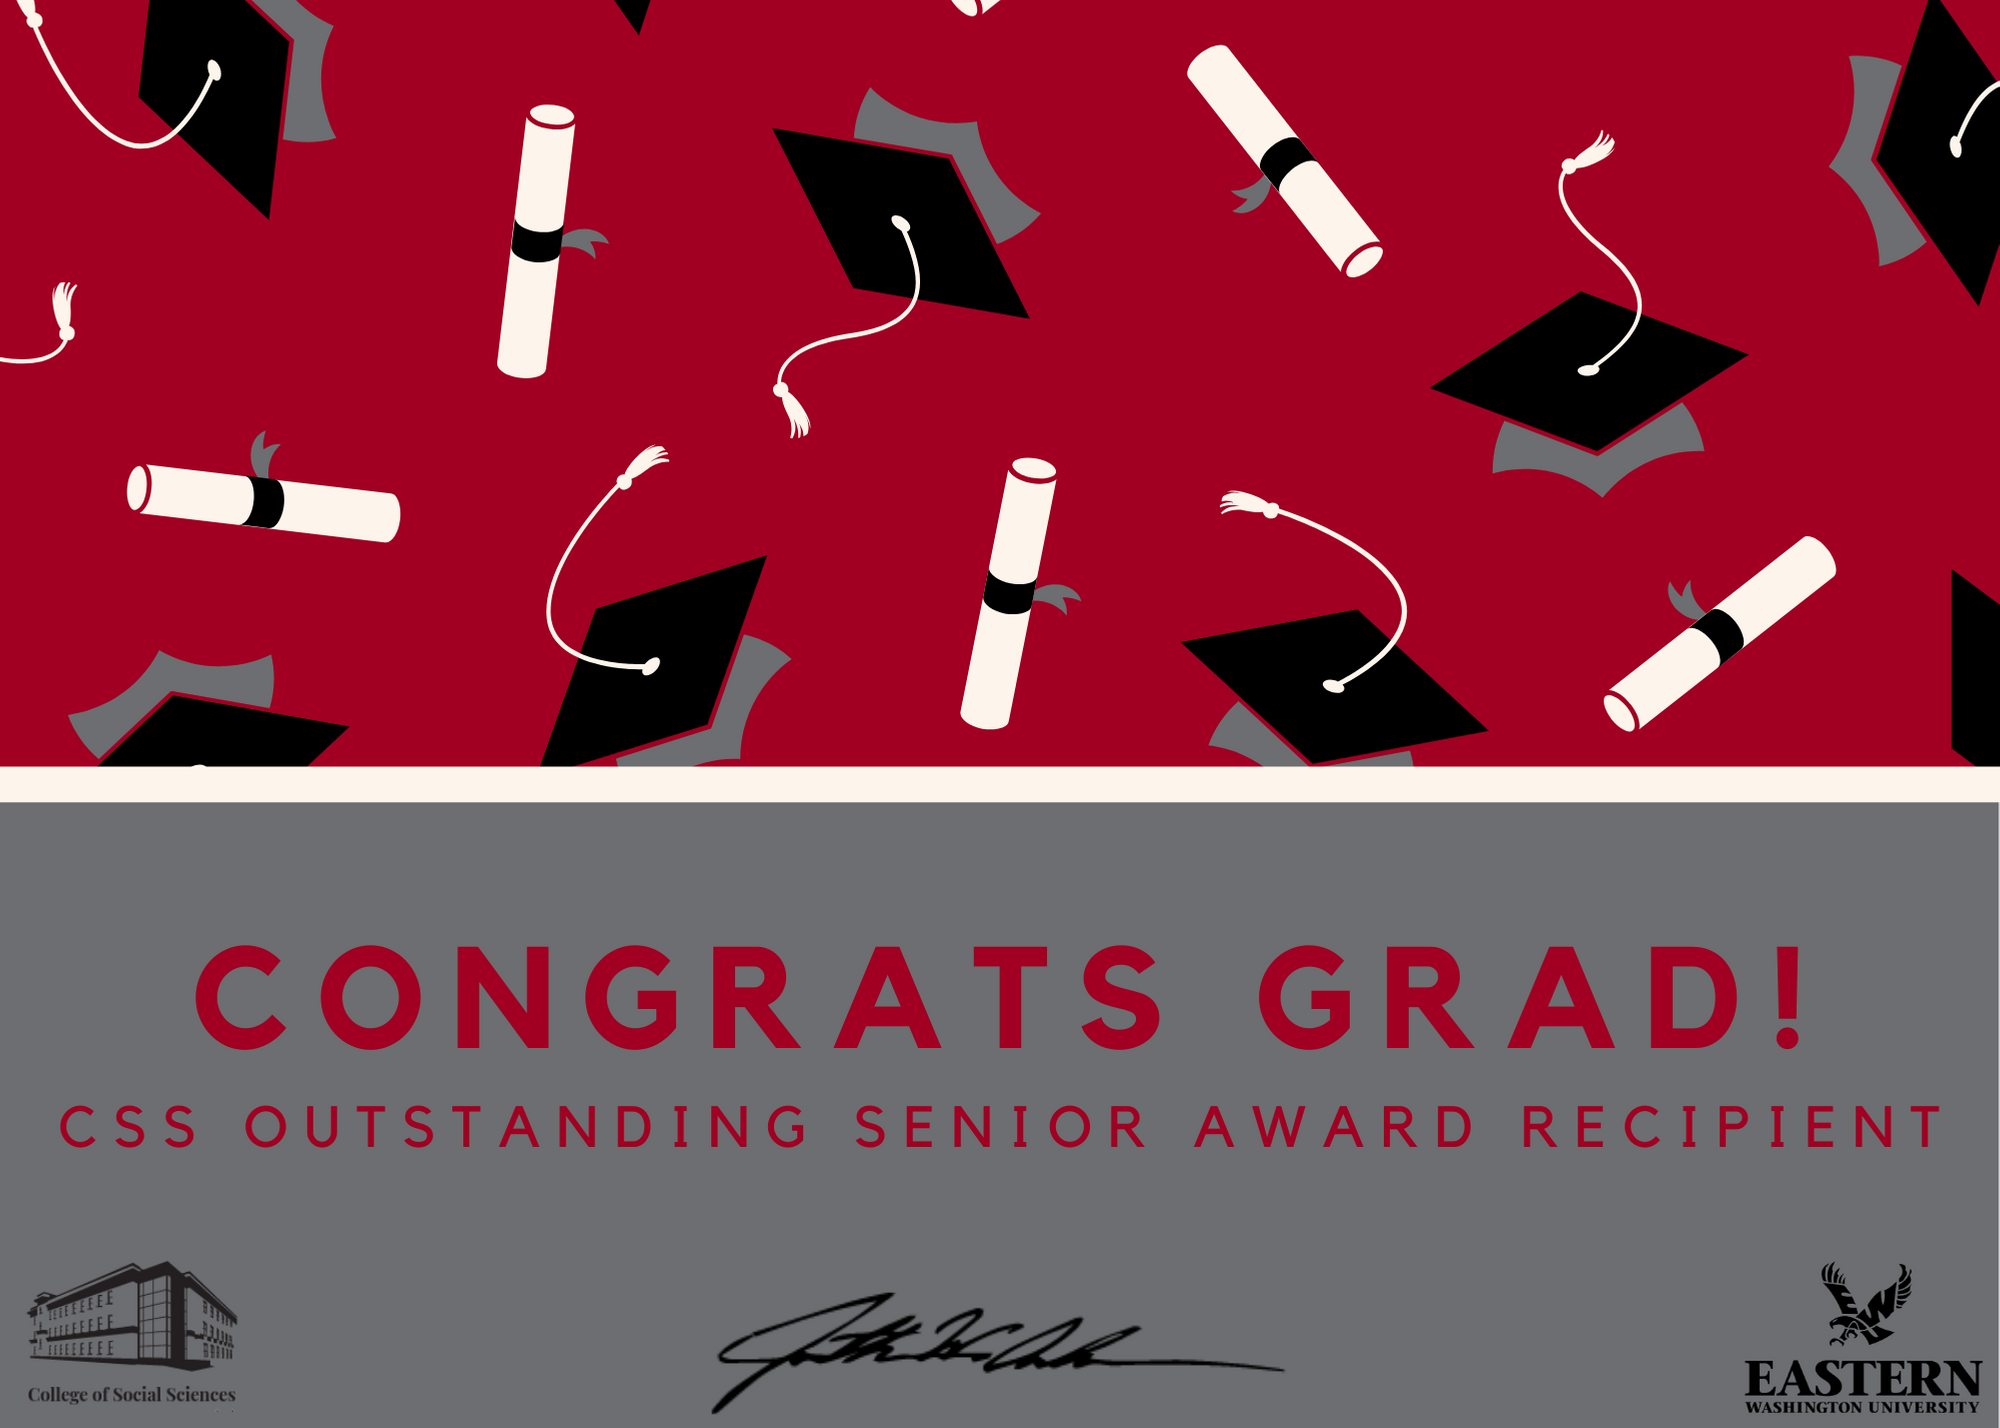 2495-caps-and-diplomas-pattern-graduation-card-2.png